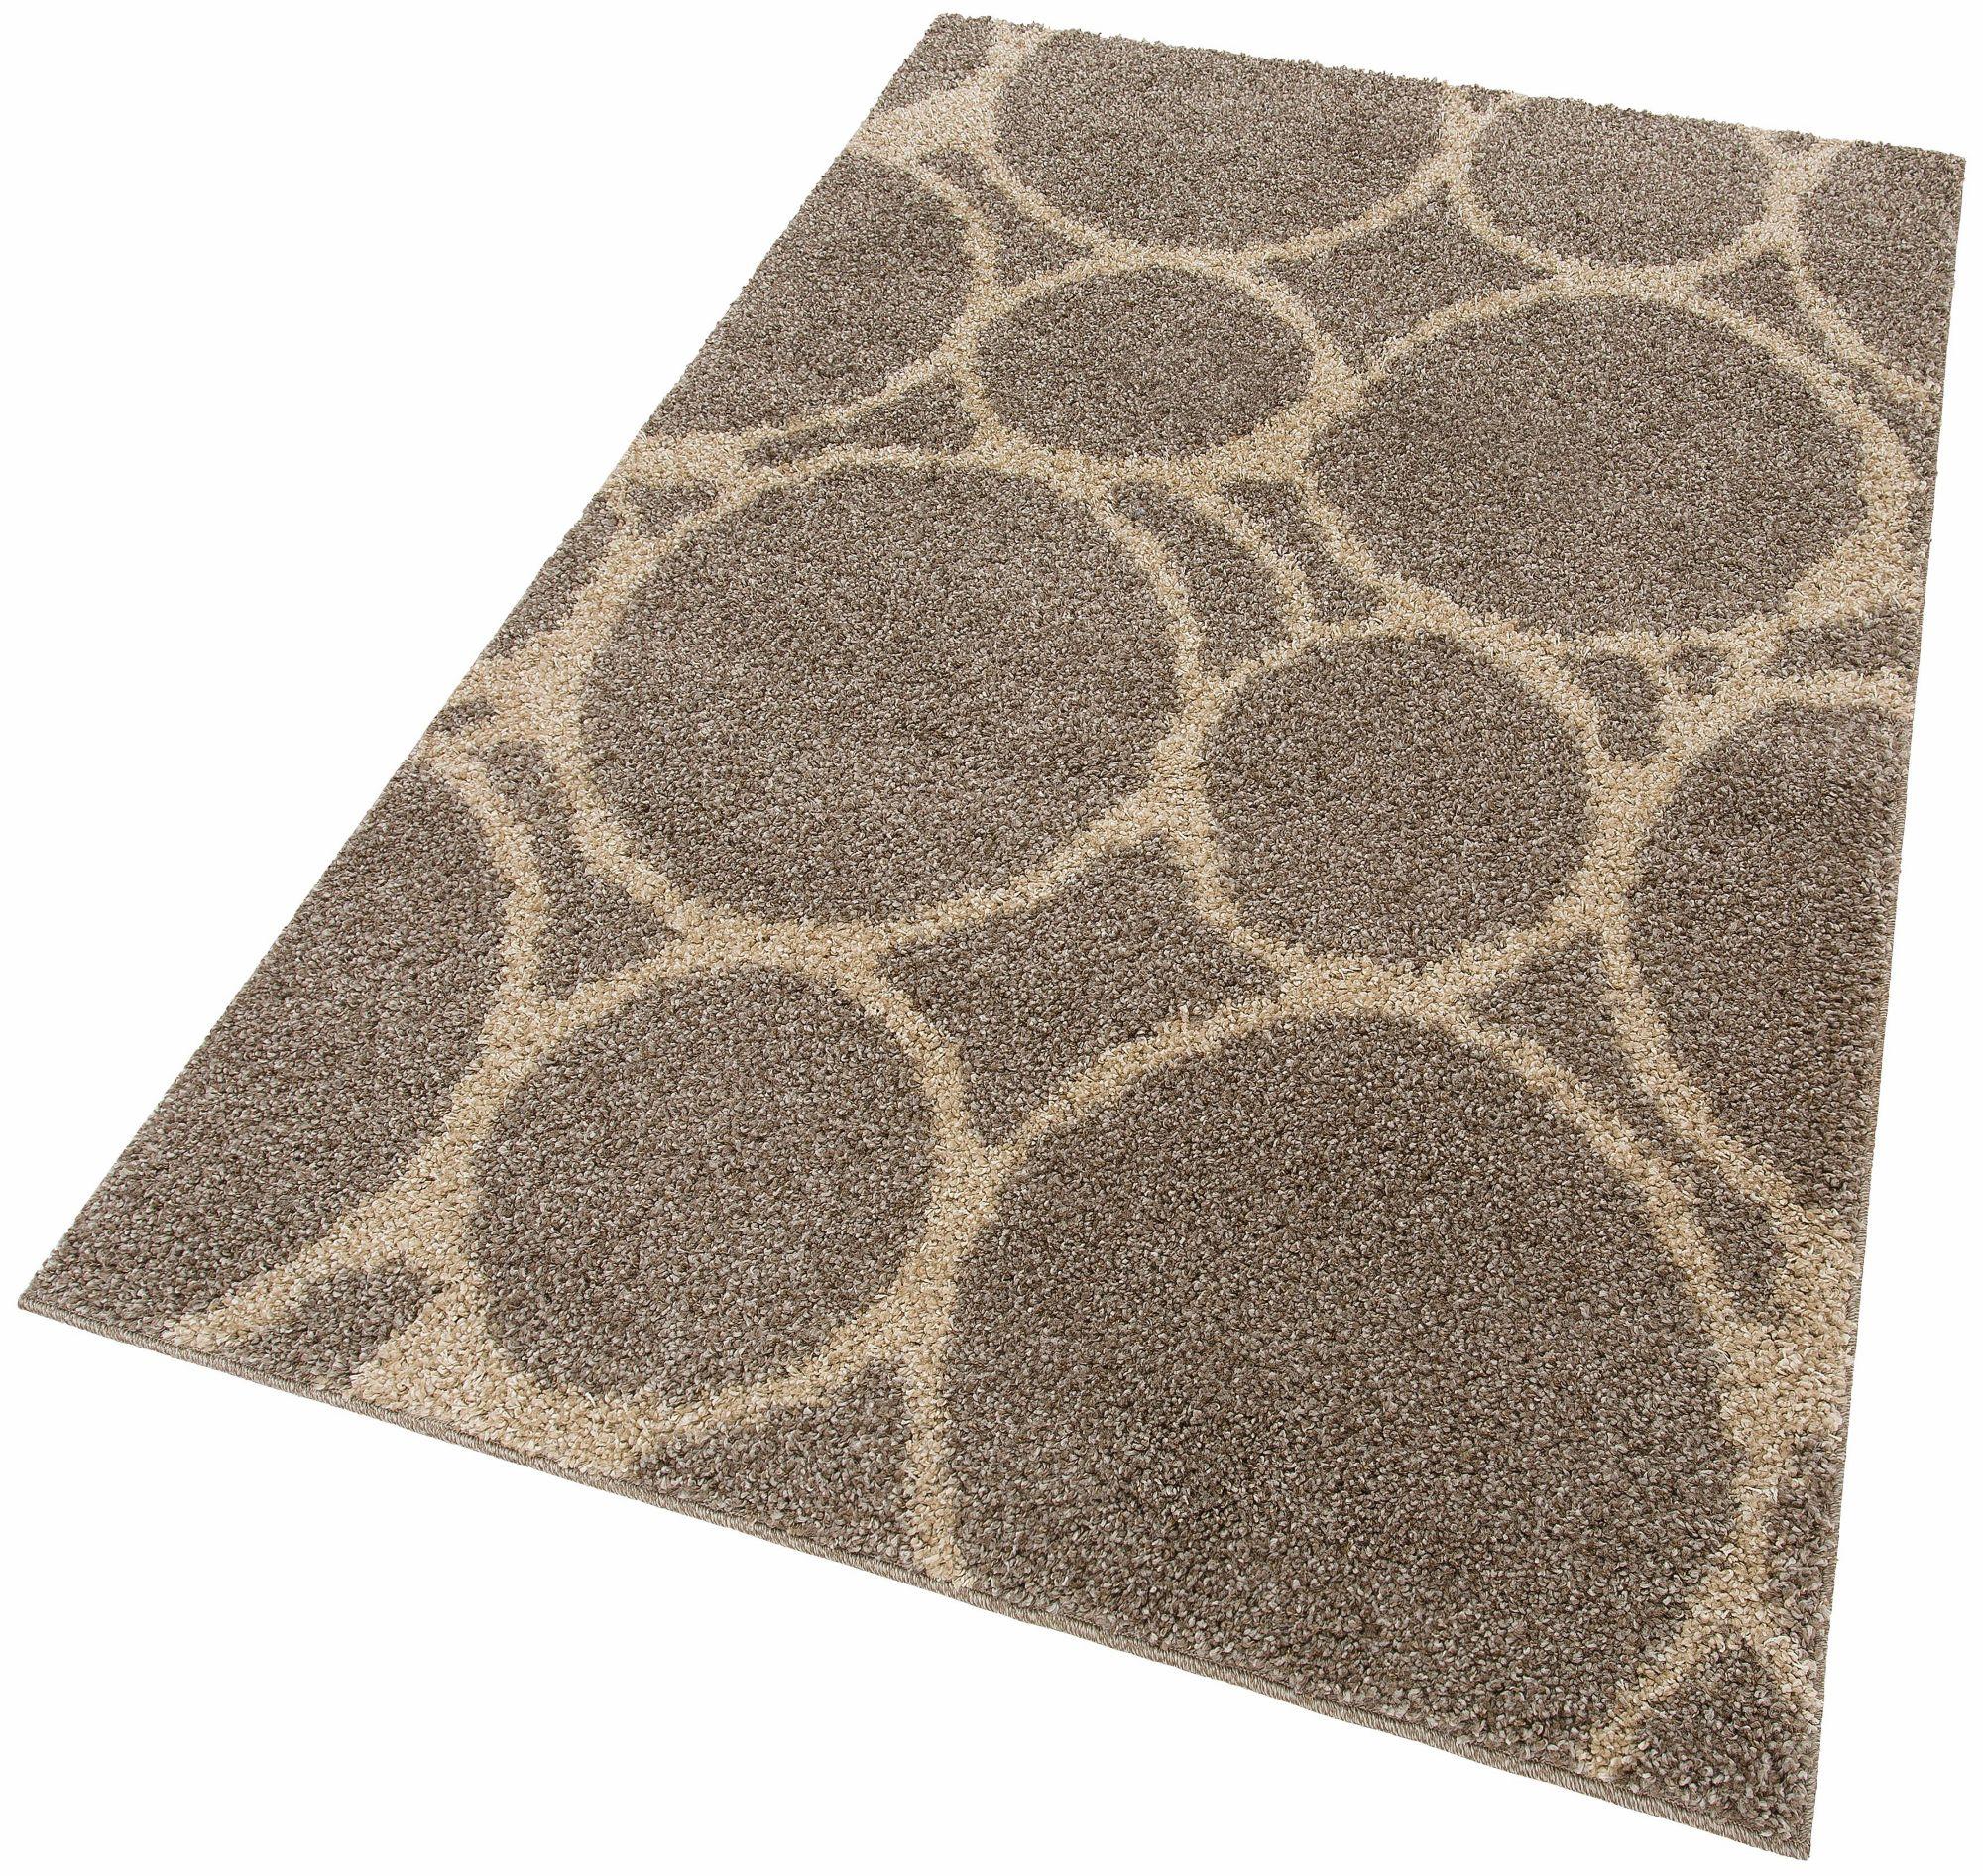 HOME AFFAIRE COLLECTION Hochflor-Teppich, Home affaire Collection, »Kaltrina«, Höhe 30 mm, gewebt